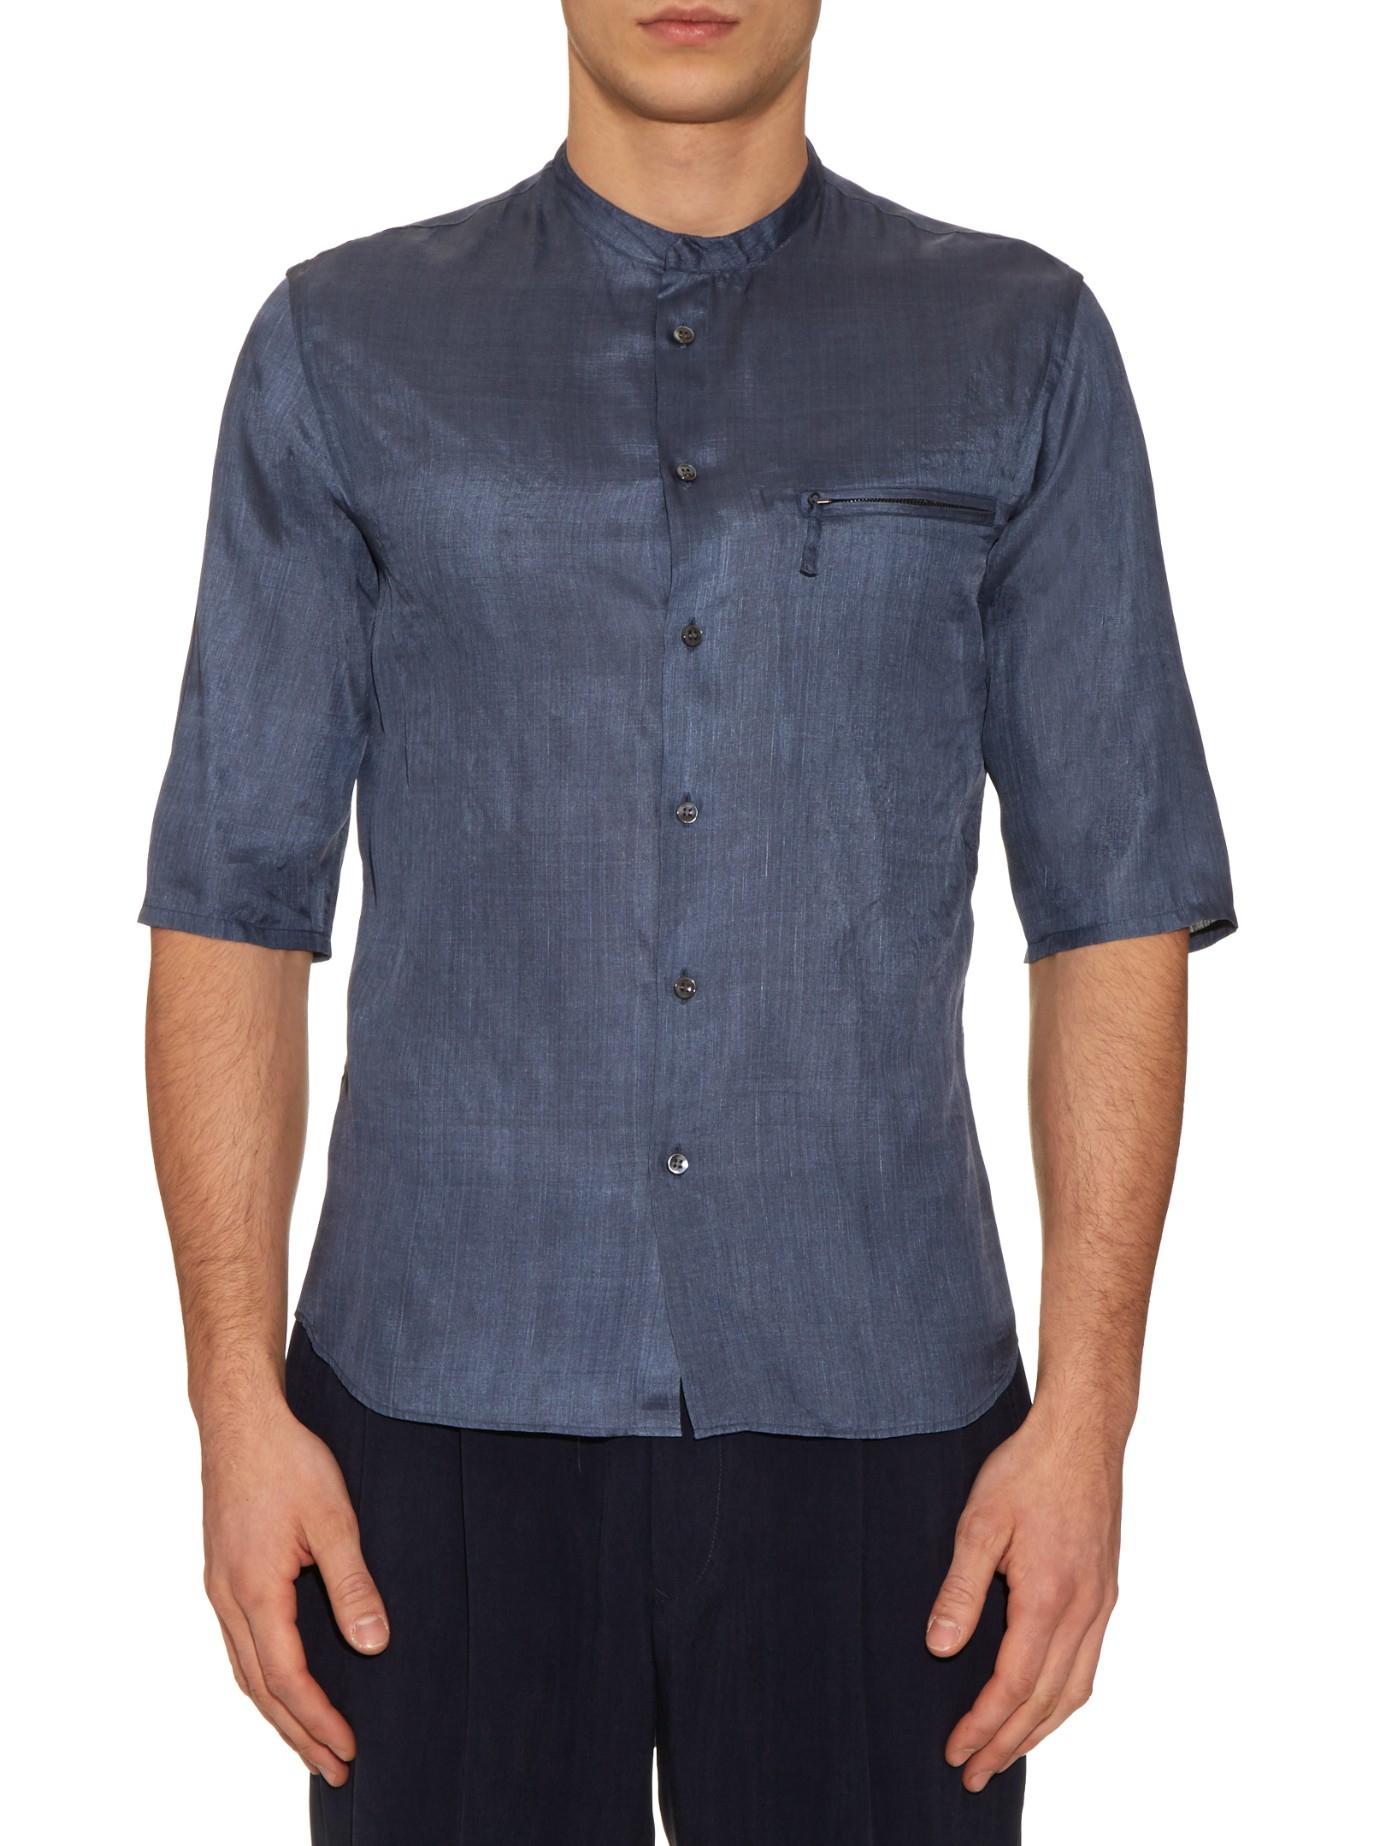 giorgio armani collarless silk shirt in gray for men lyst